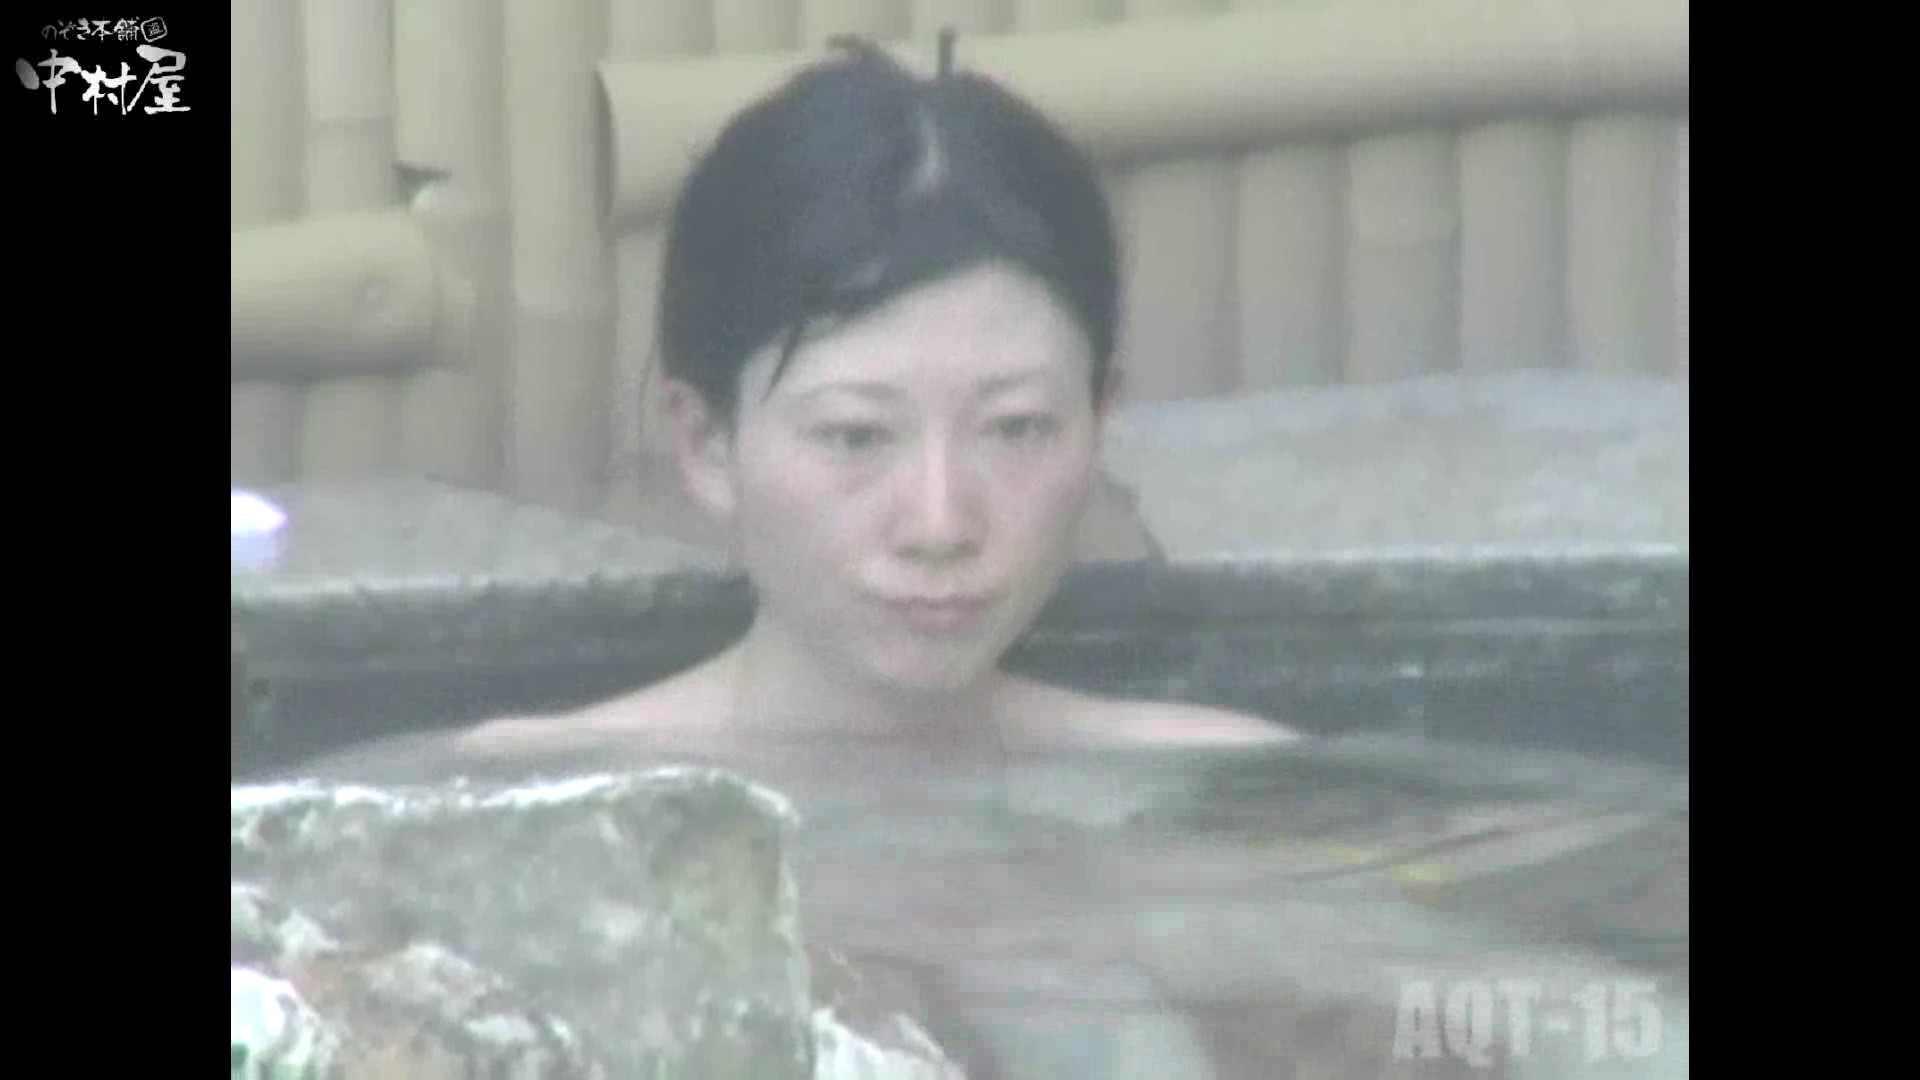 Aquaな露天風呂Vol.878潜入盗撮露天風呂十五判湯 其の五 露天風呂編  112PIX 48